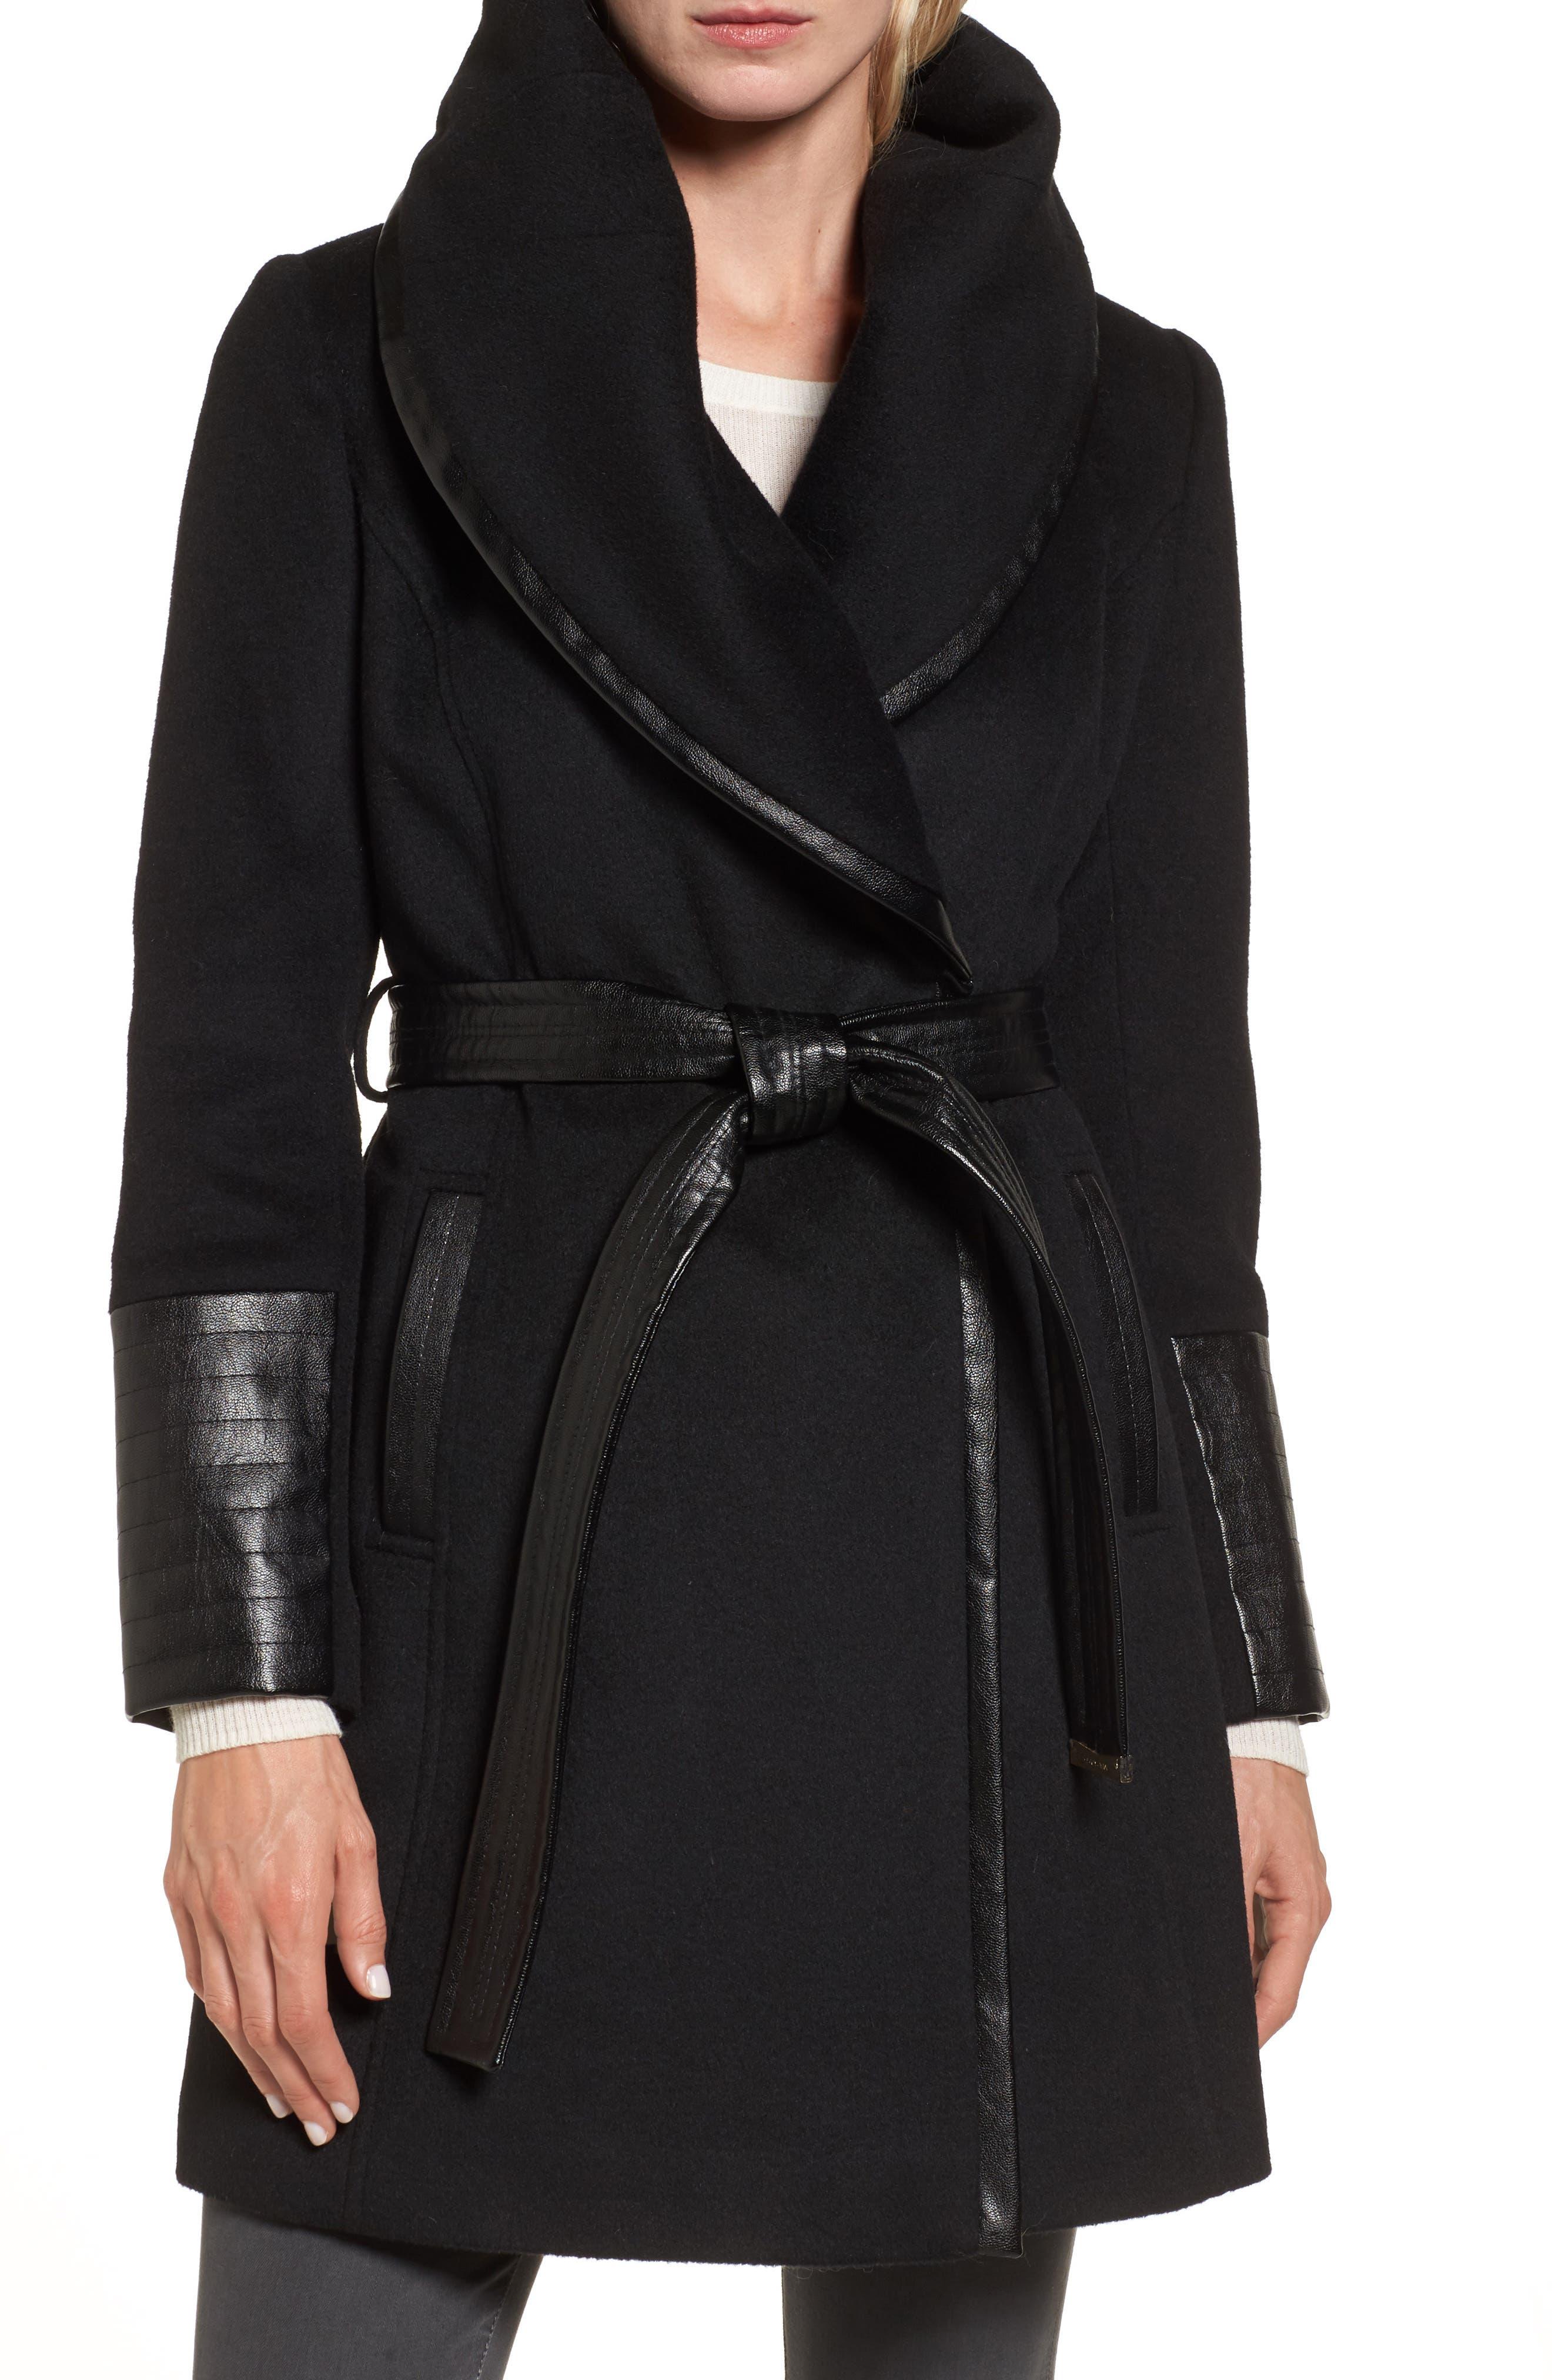 Main Image - Via Spiga Wool Blend Coat